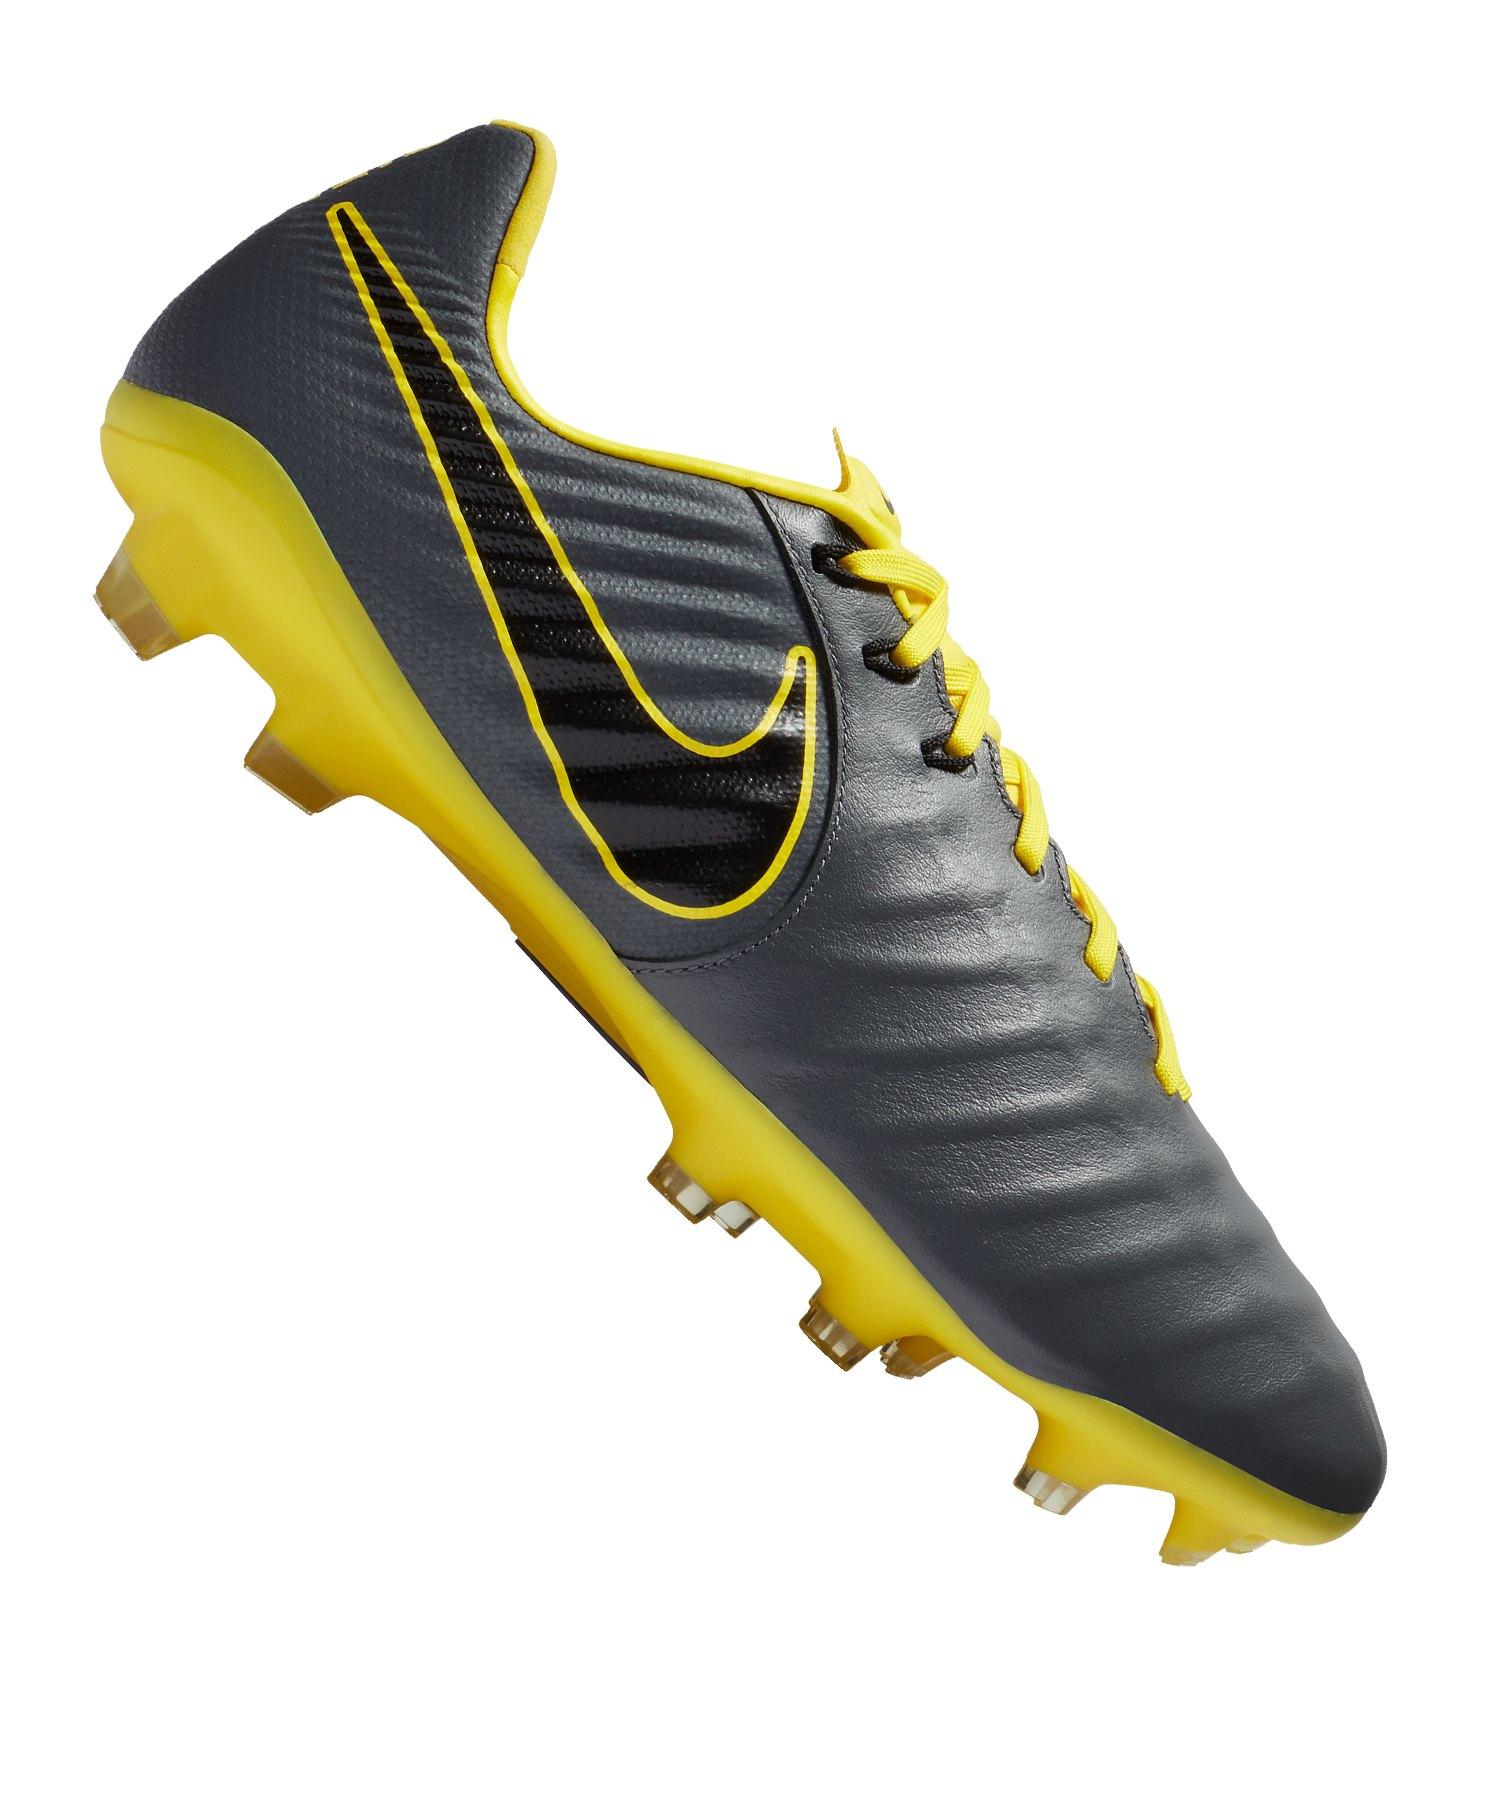 cheaper be1e5 72cde Nike Tiempo Legend VII Pro FG Grau Gelb F070 - Grau